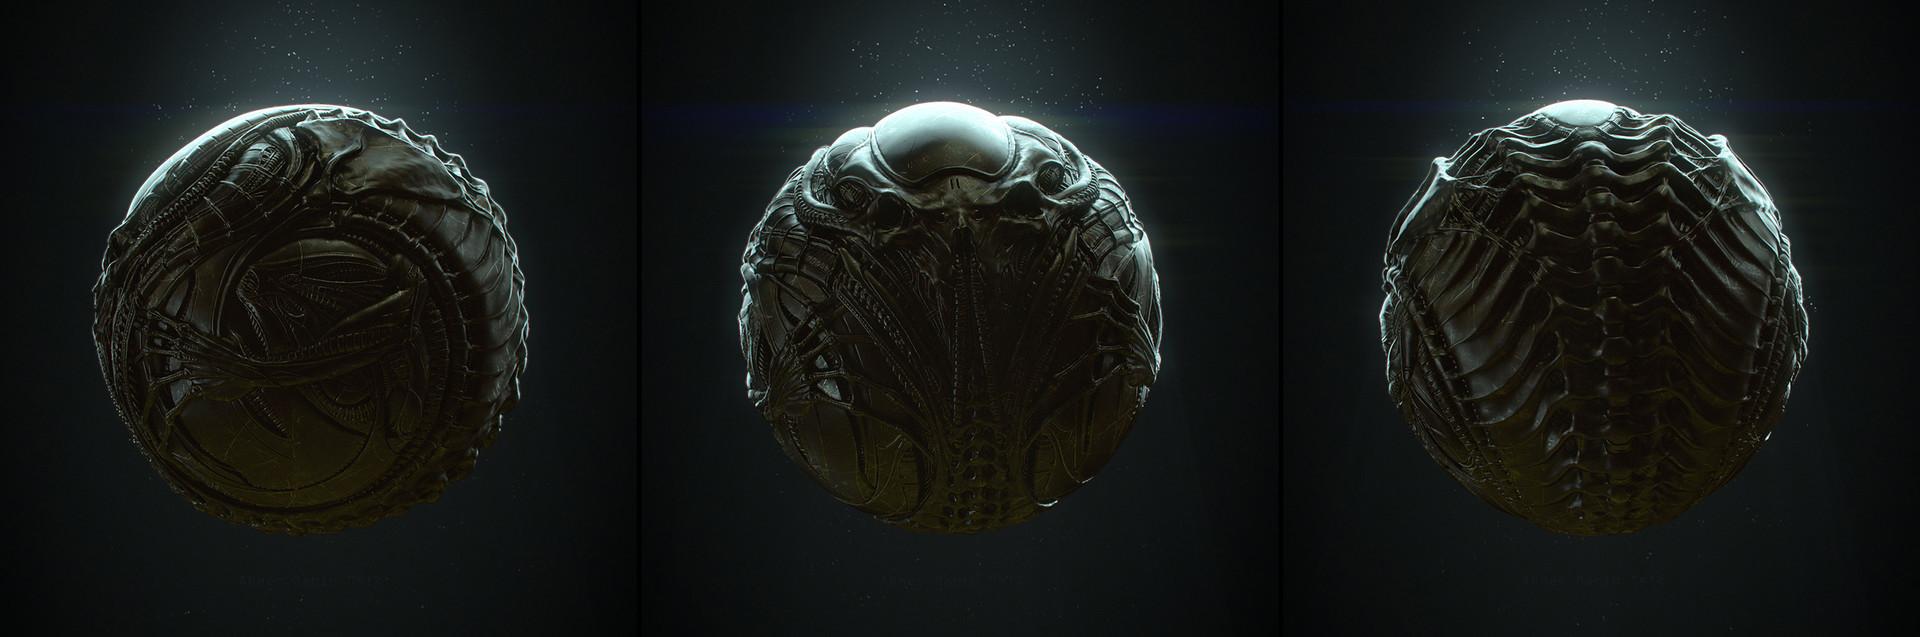 Abner marin alienartifact triptic small